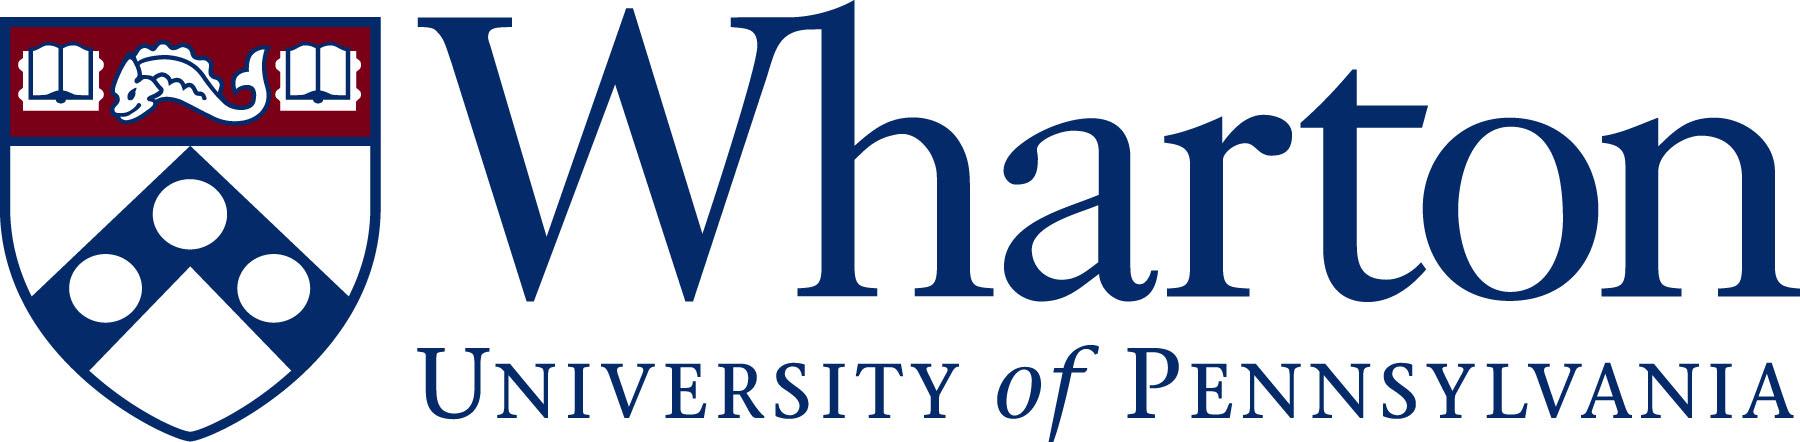 https://gflec.org/wp-content/uploads/2014/10/HomepagePage-Wharton-School.jpg